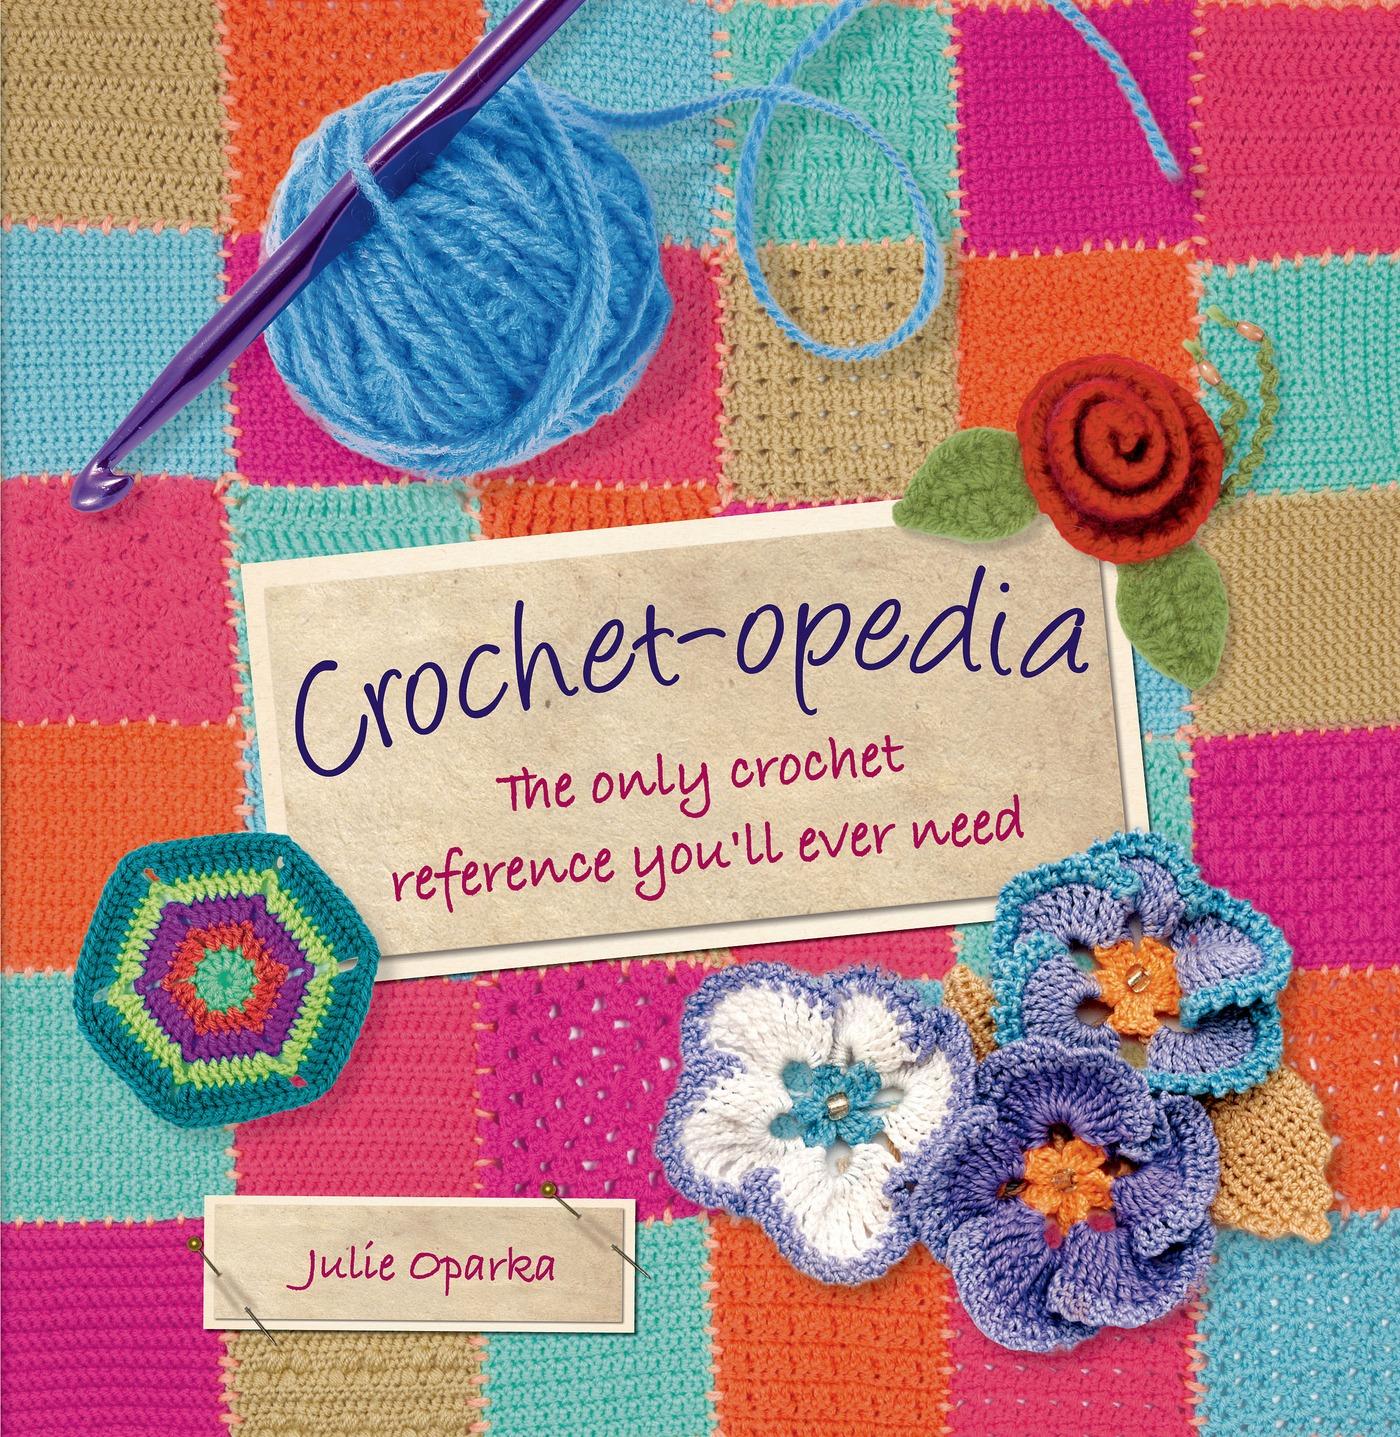 Crochet-opedia